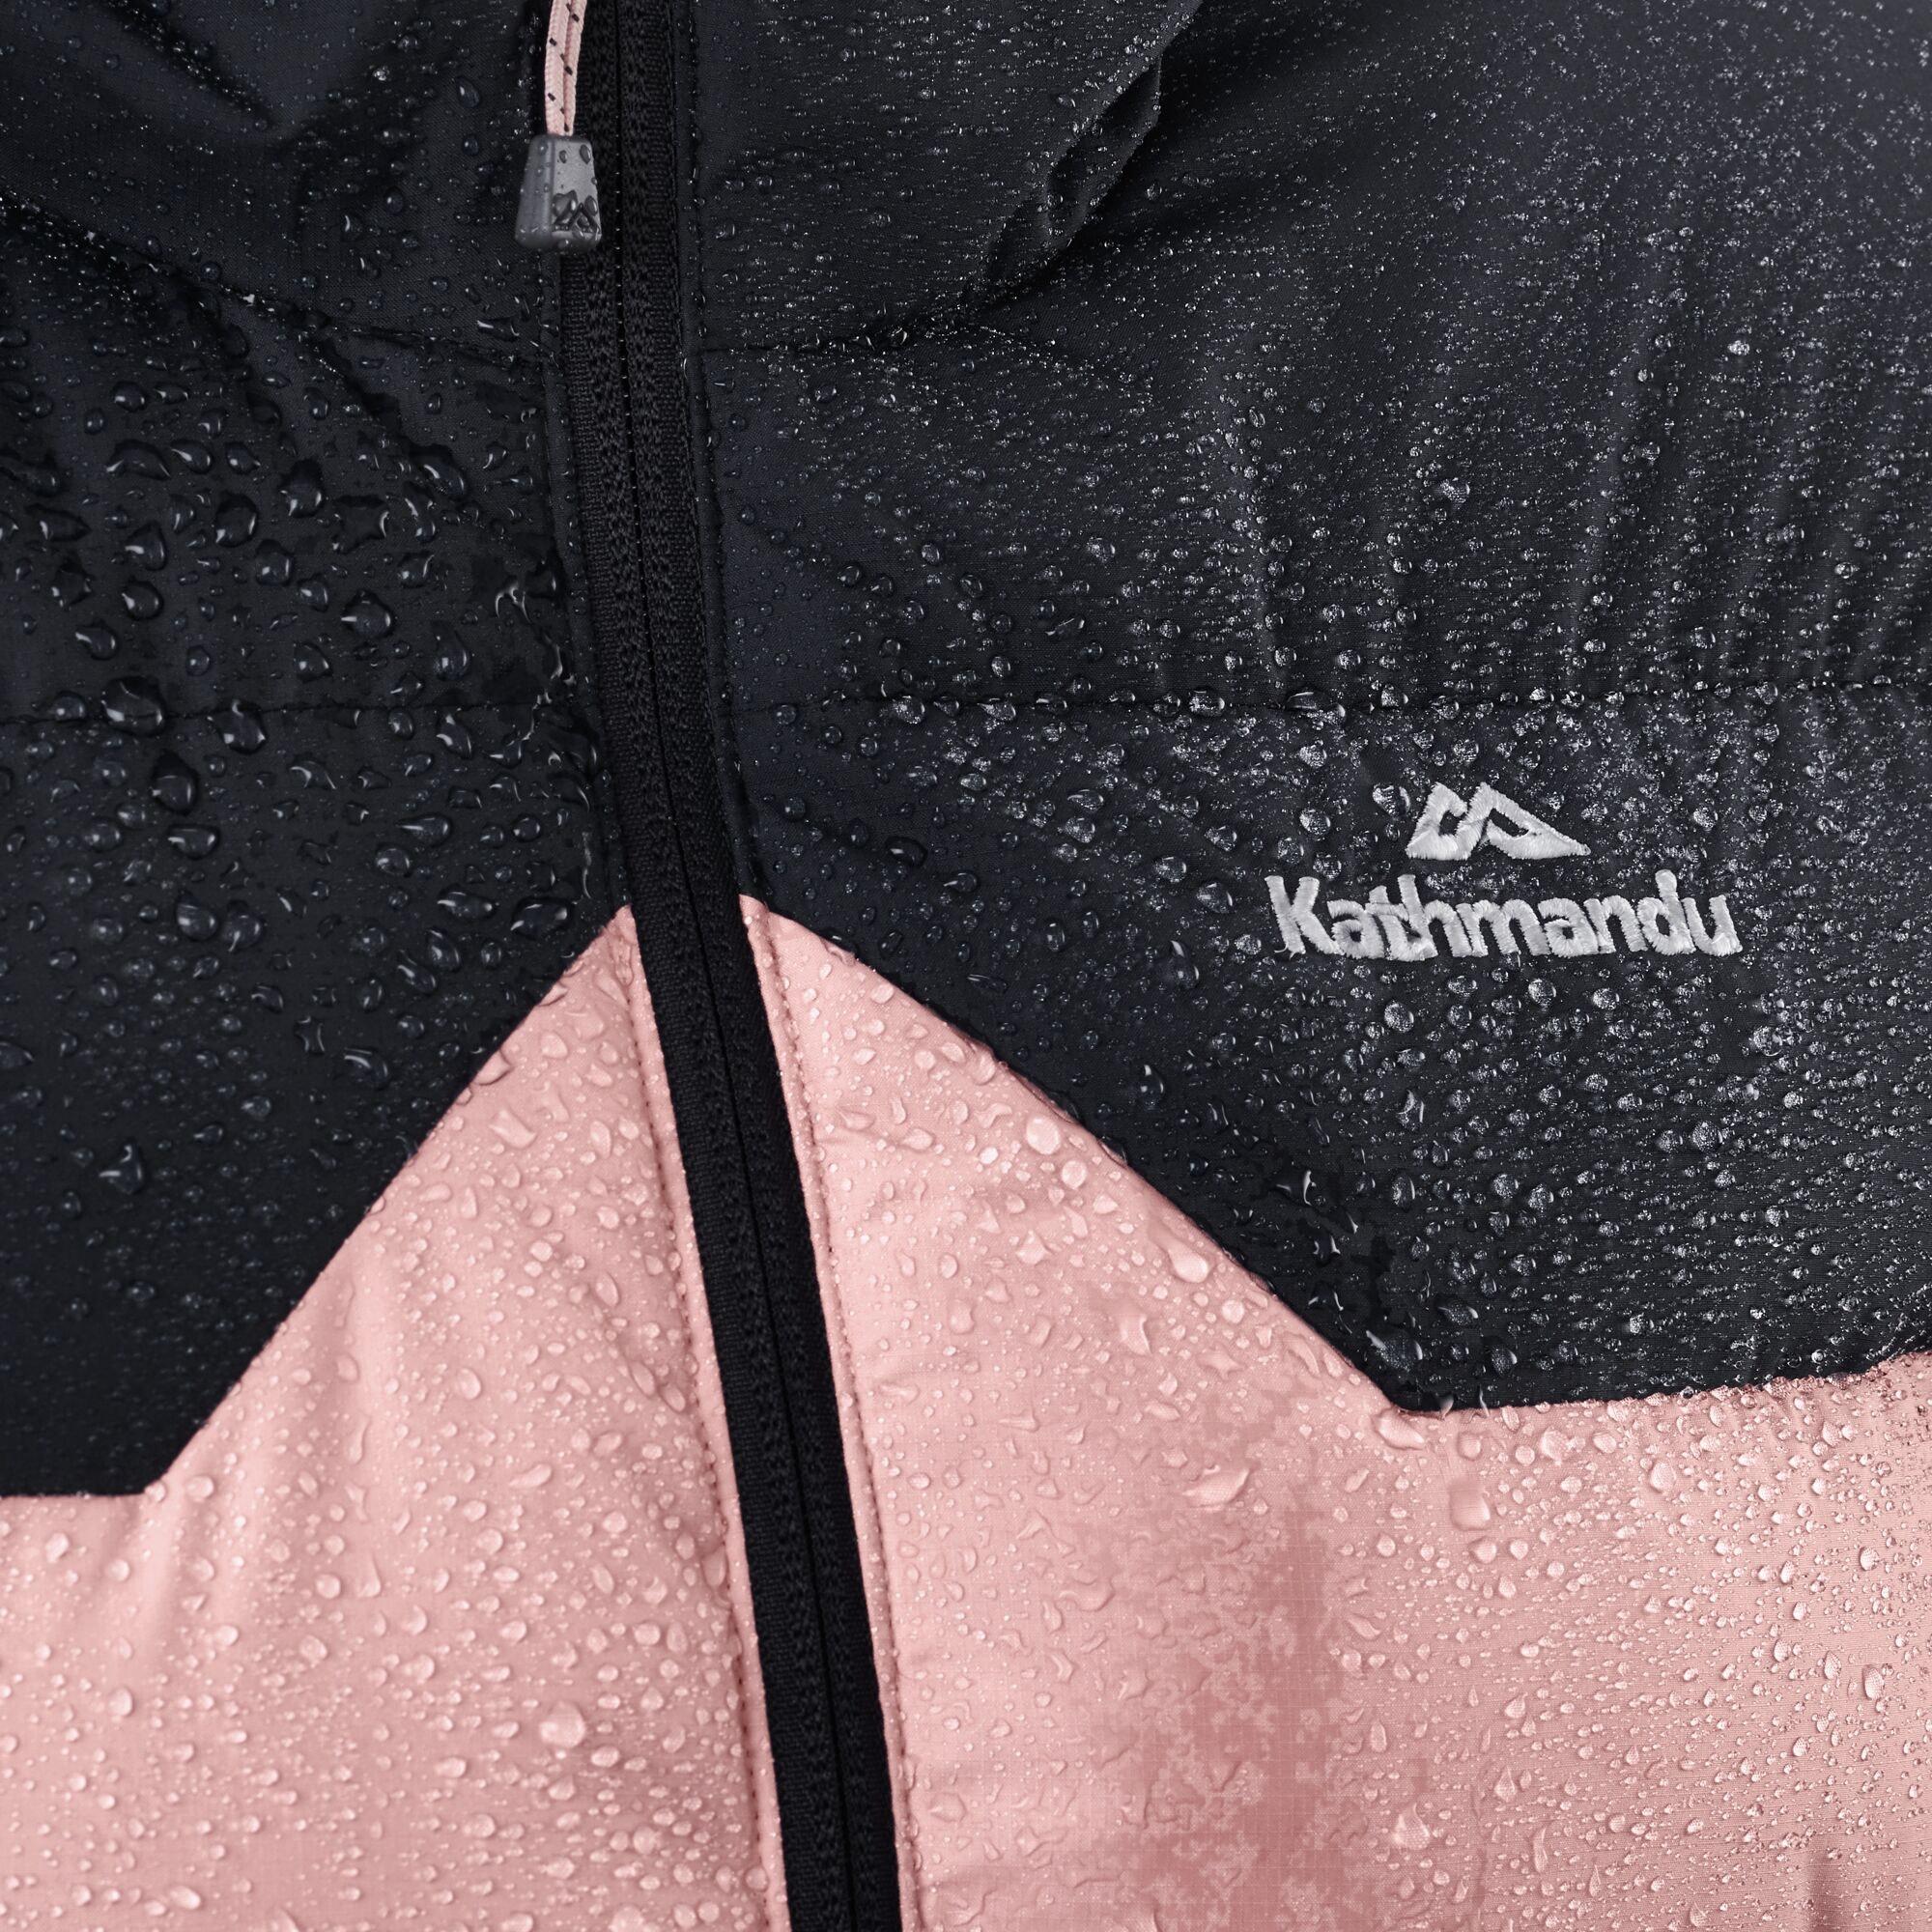 thumbnail 26 - NEW Kathmandu Epiq Womens Hooded Down Puffer 600 Fill Warm Outdoor Winter Jacket